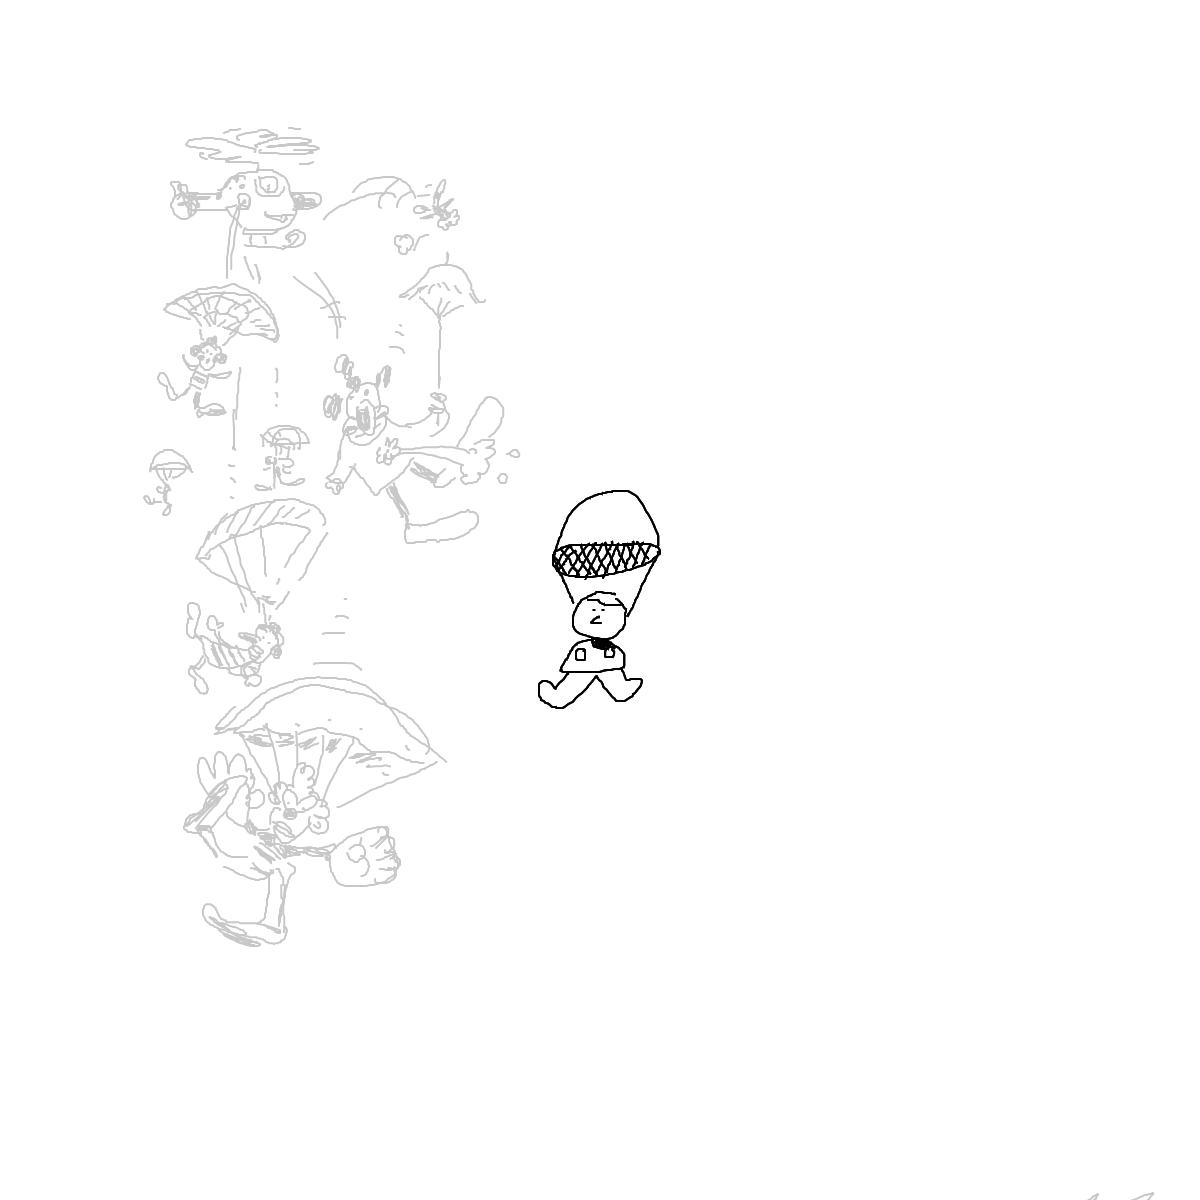 BAAAM drawing#24384 lat:78.4202880859375000lng: -4.4836621284484860